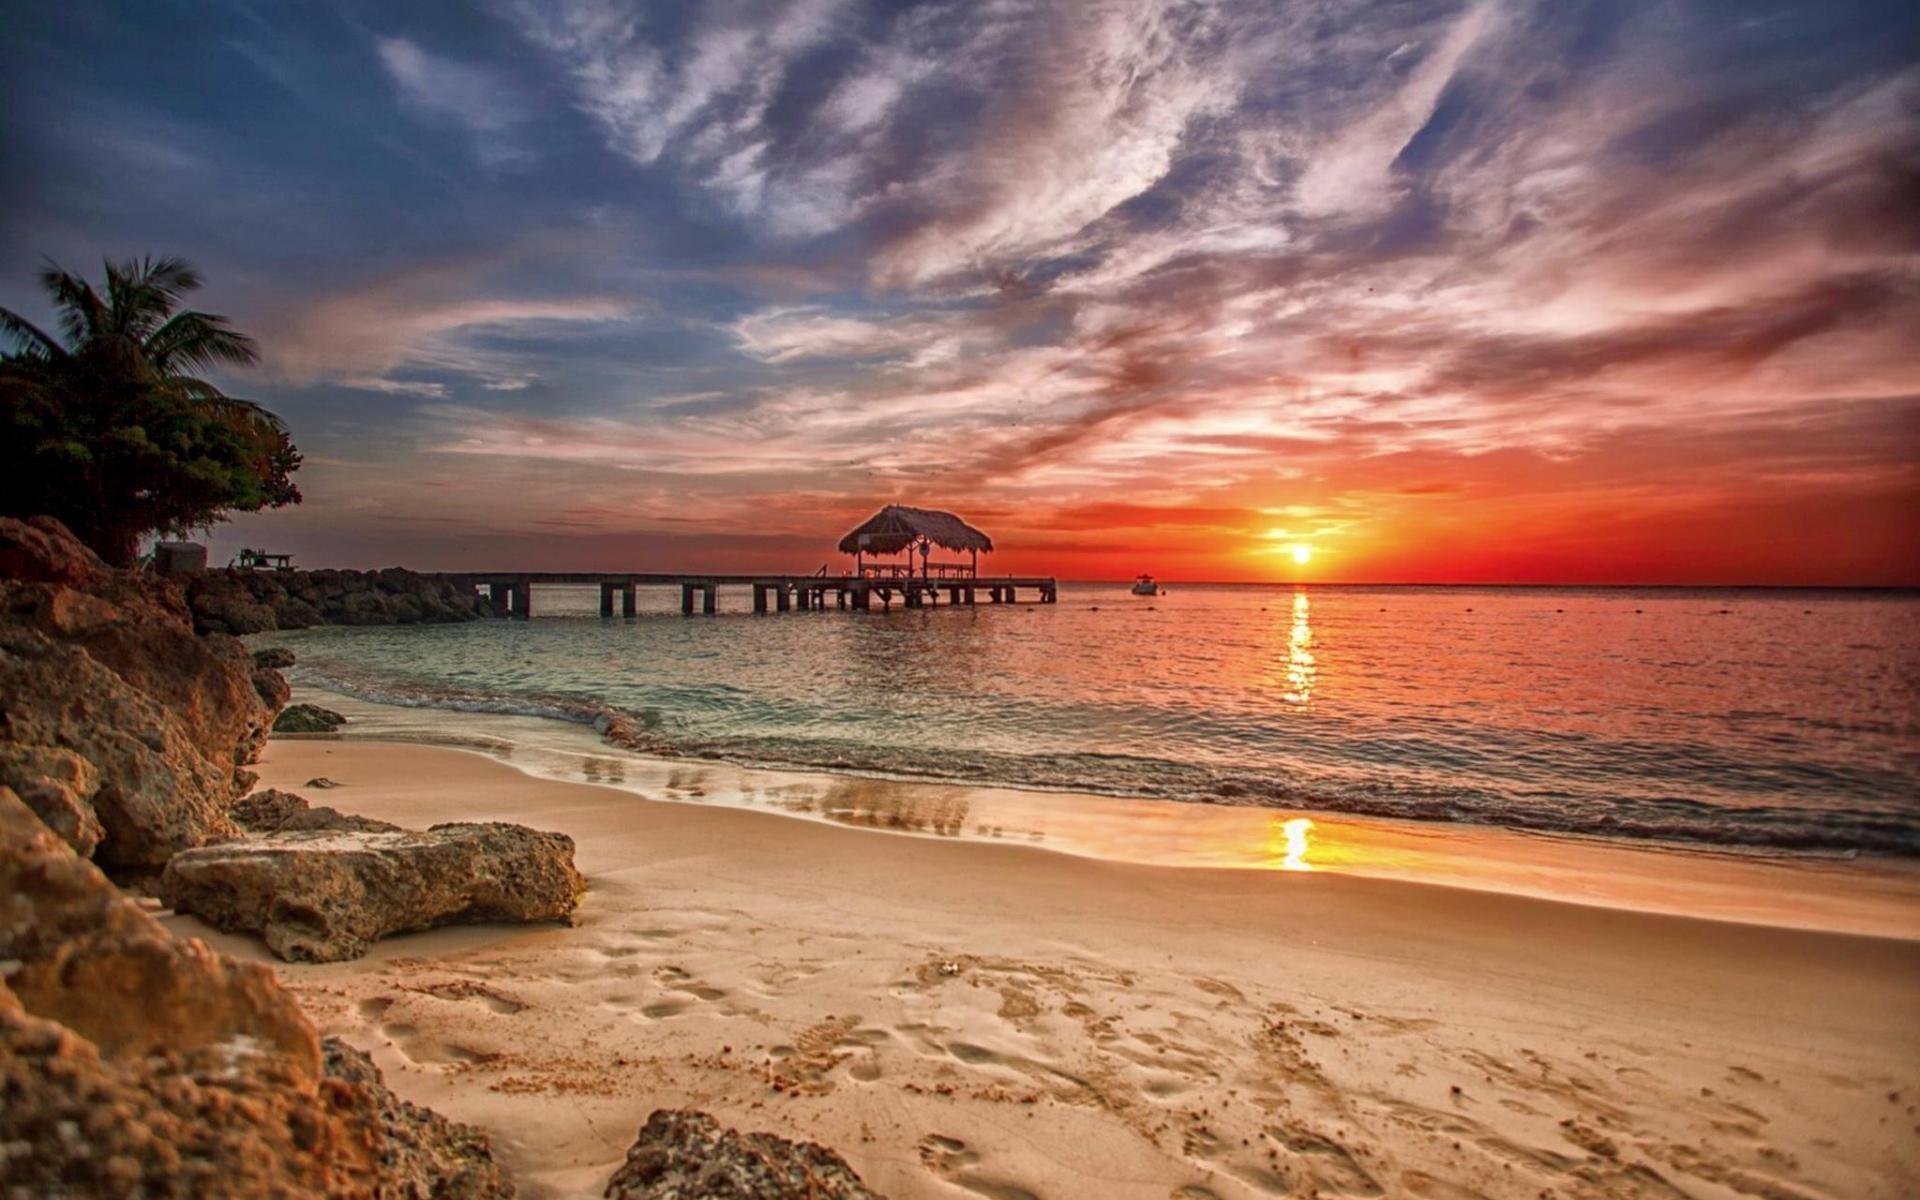 summer sunset high resolution wallpaper download summer sunset images free